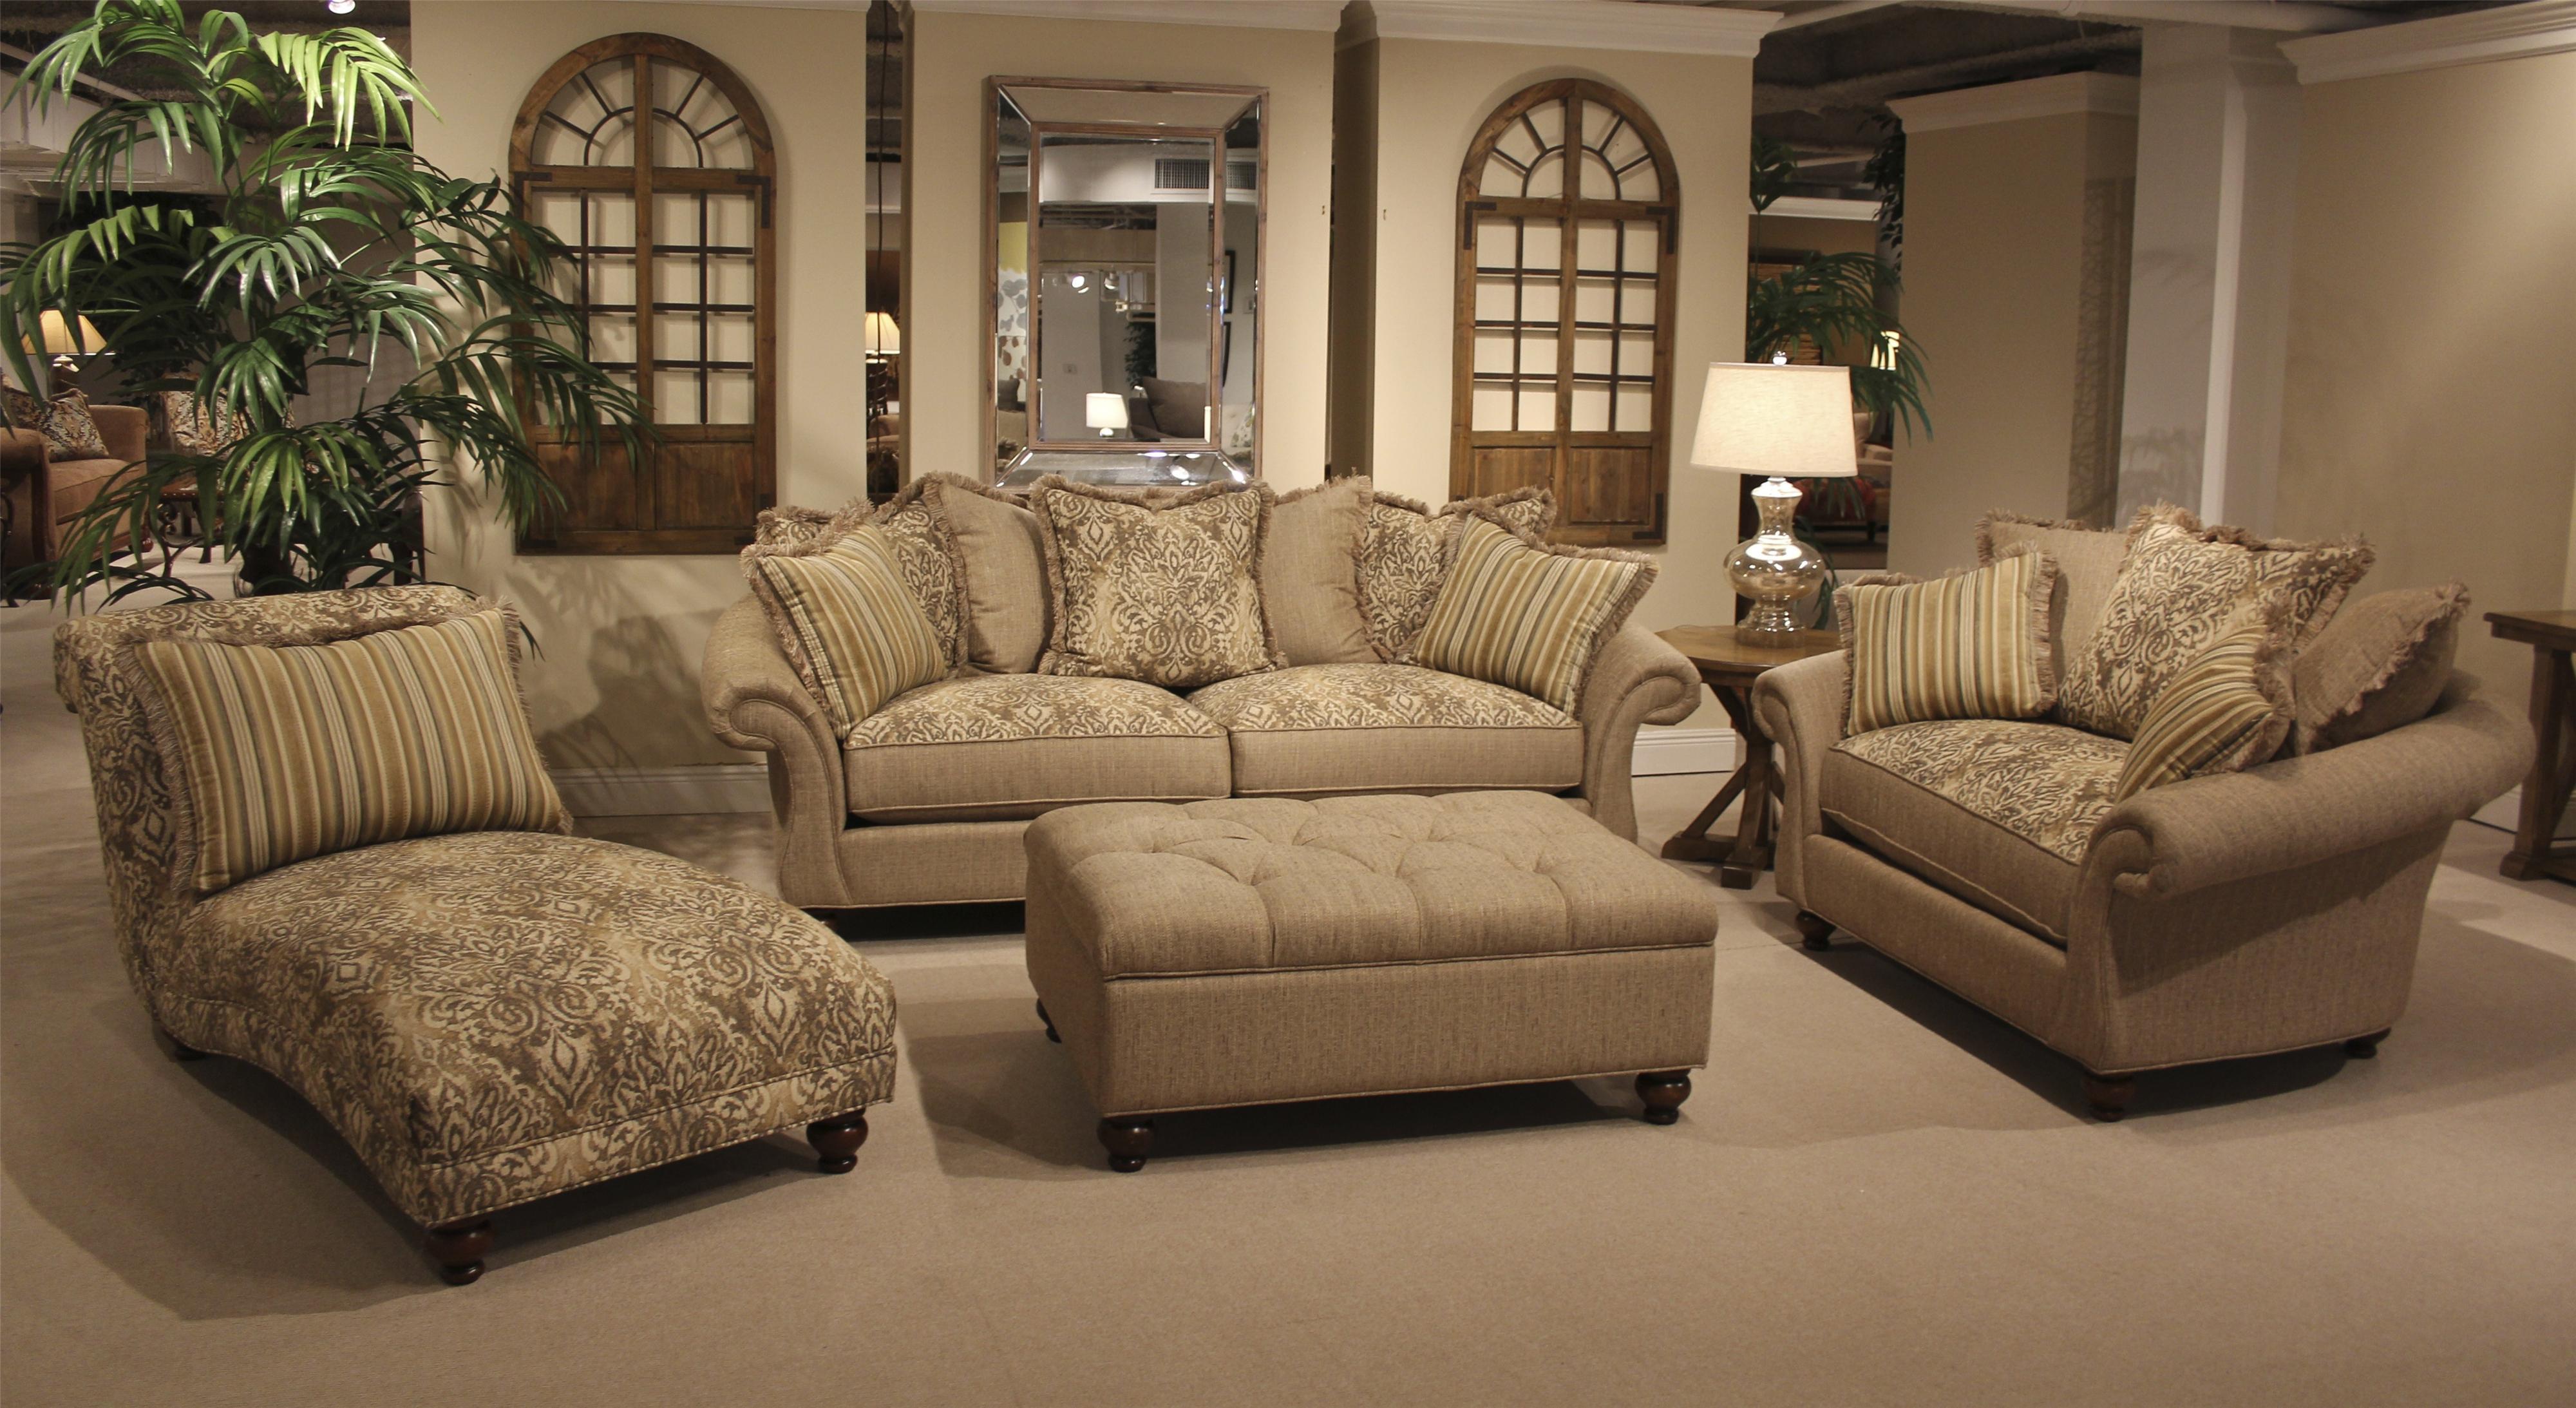 HM Richards Allouetta   Praire Traditional Chaise Lounge    BigFurnitureWebsite   Chaise